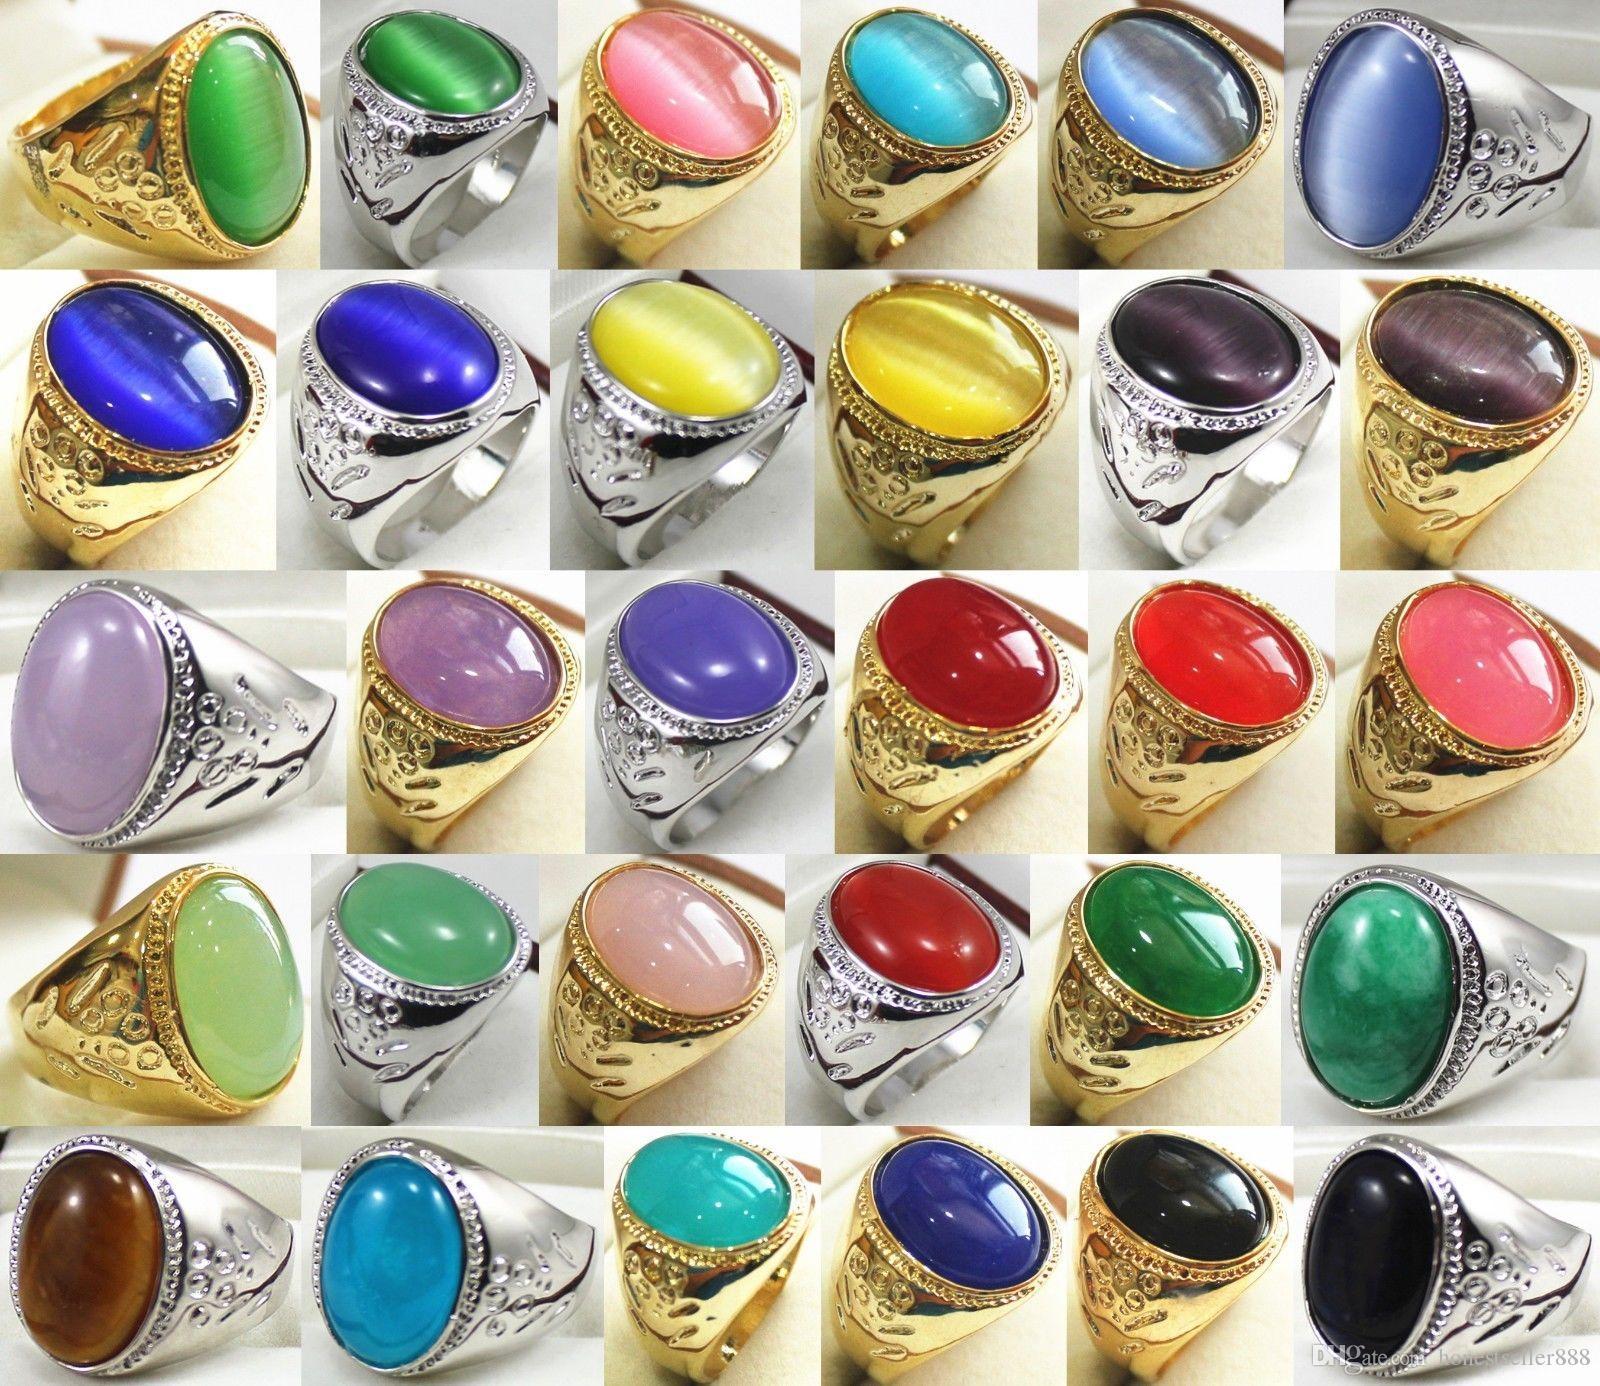 13 * 18mm vert / rouge / violet / bleu / jaune jade rouge agate Jade 18KGP hommes taille de l'anneau: 8.9.10.11